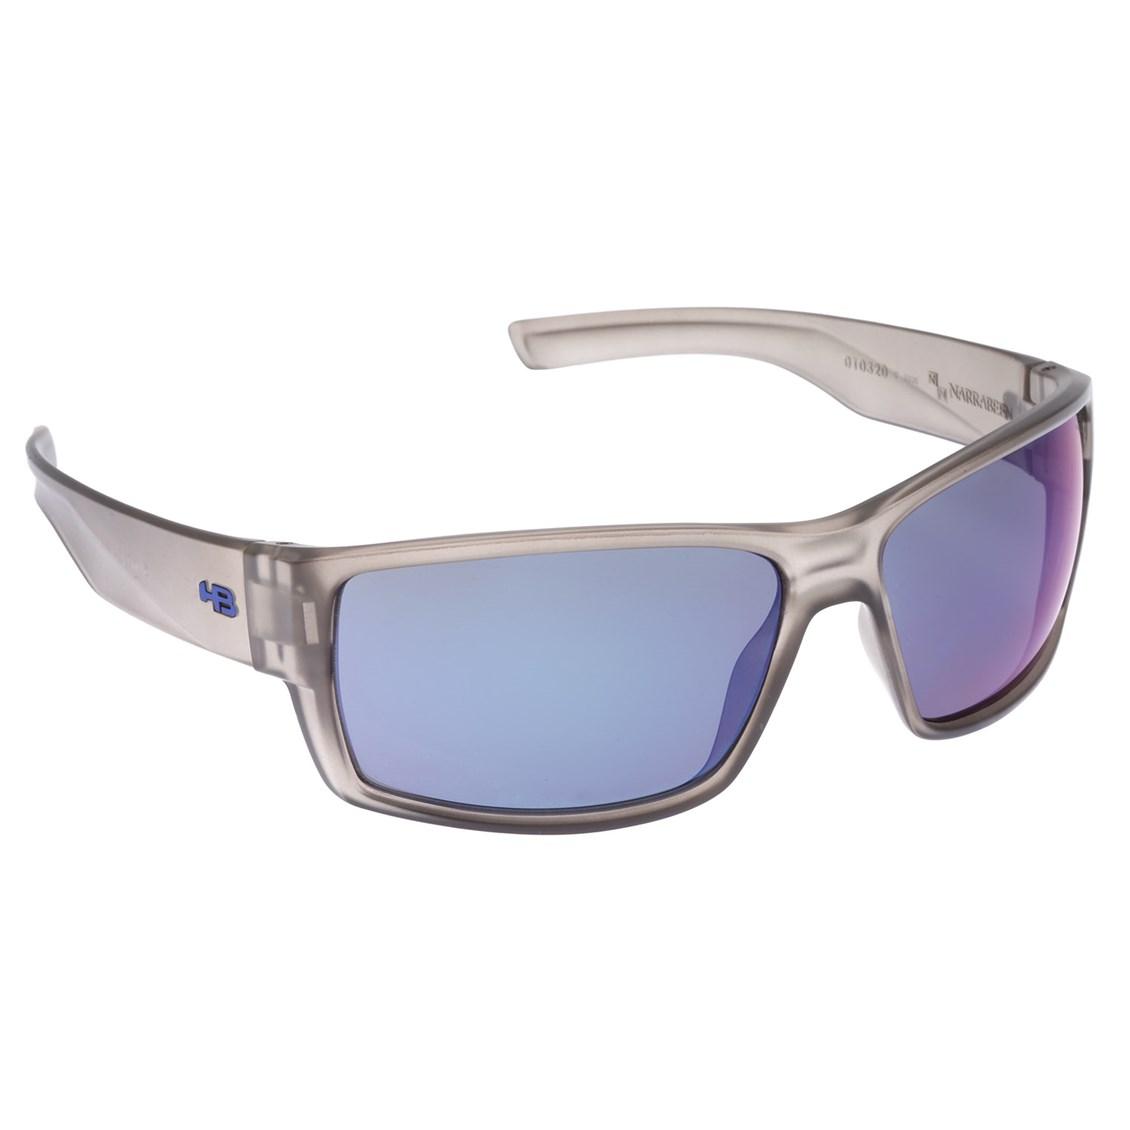 Óculos de Sol HB Narrabeen Onyx Blue Chrome